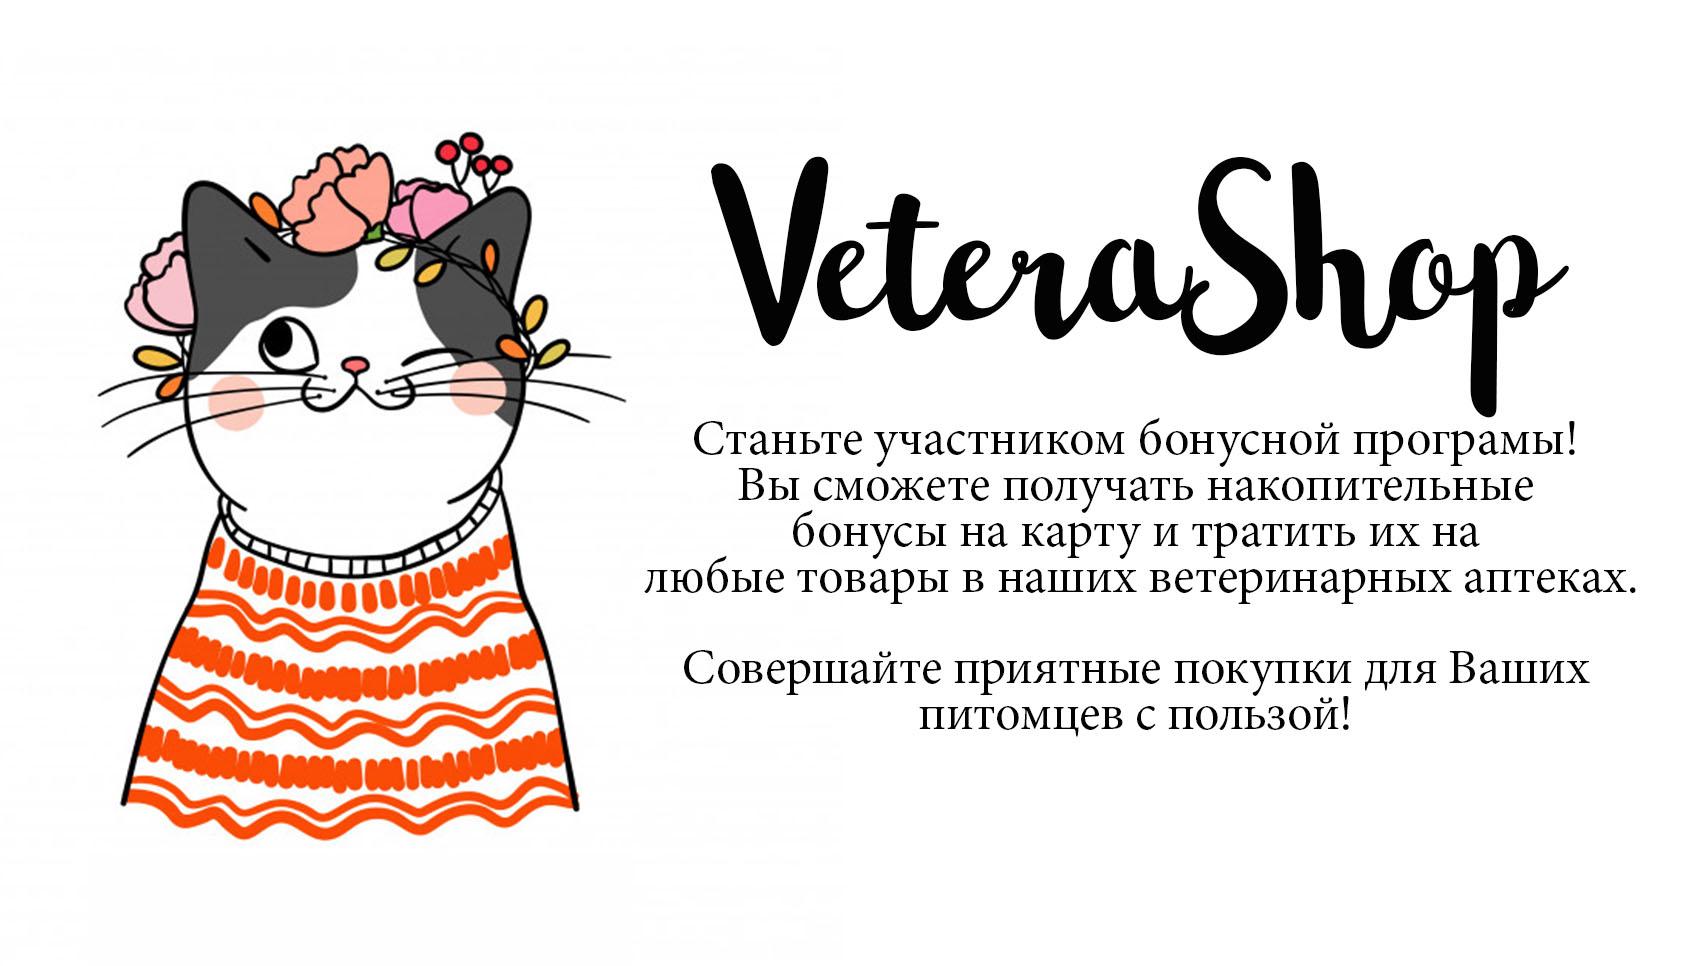 Бонусная программа Vetera Shop